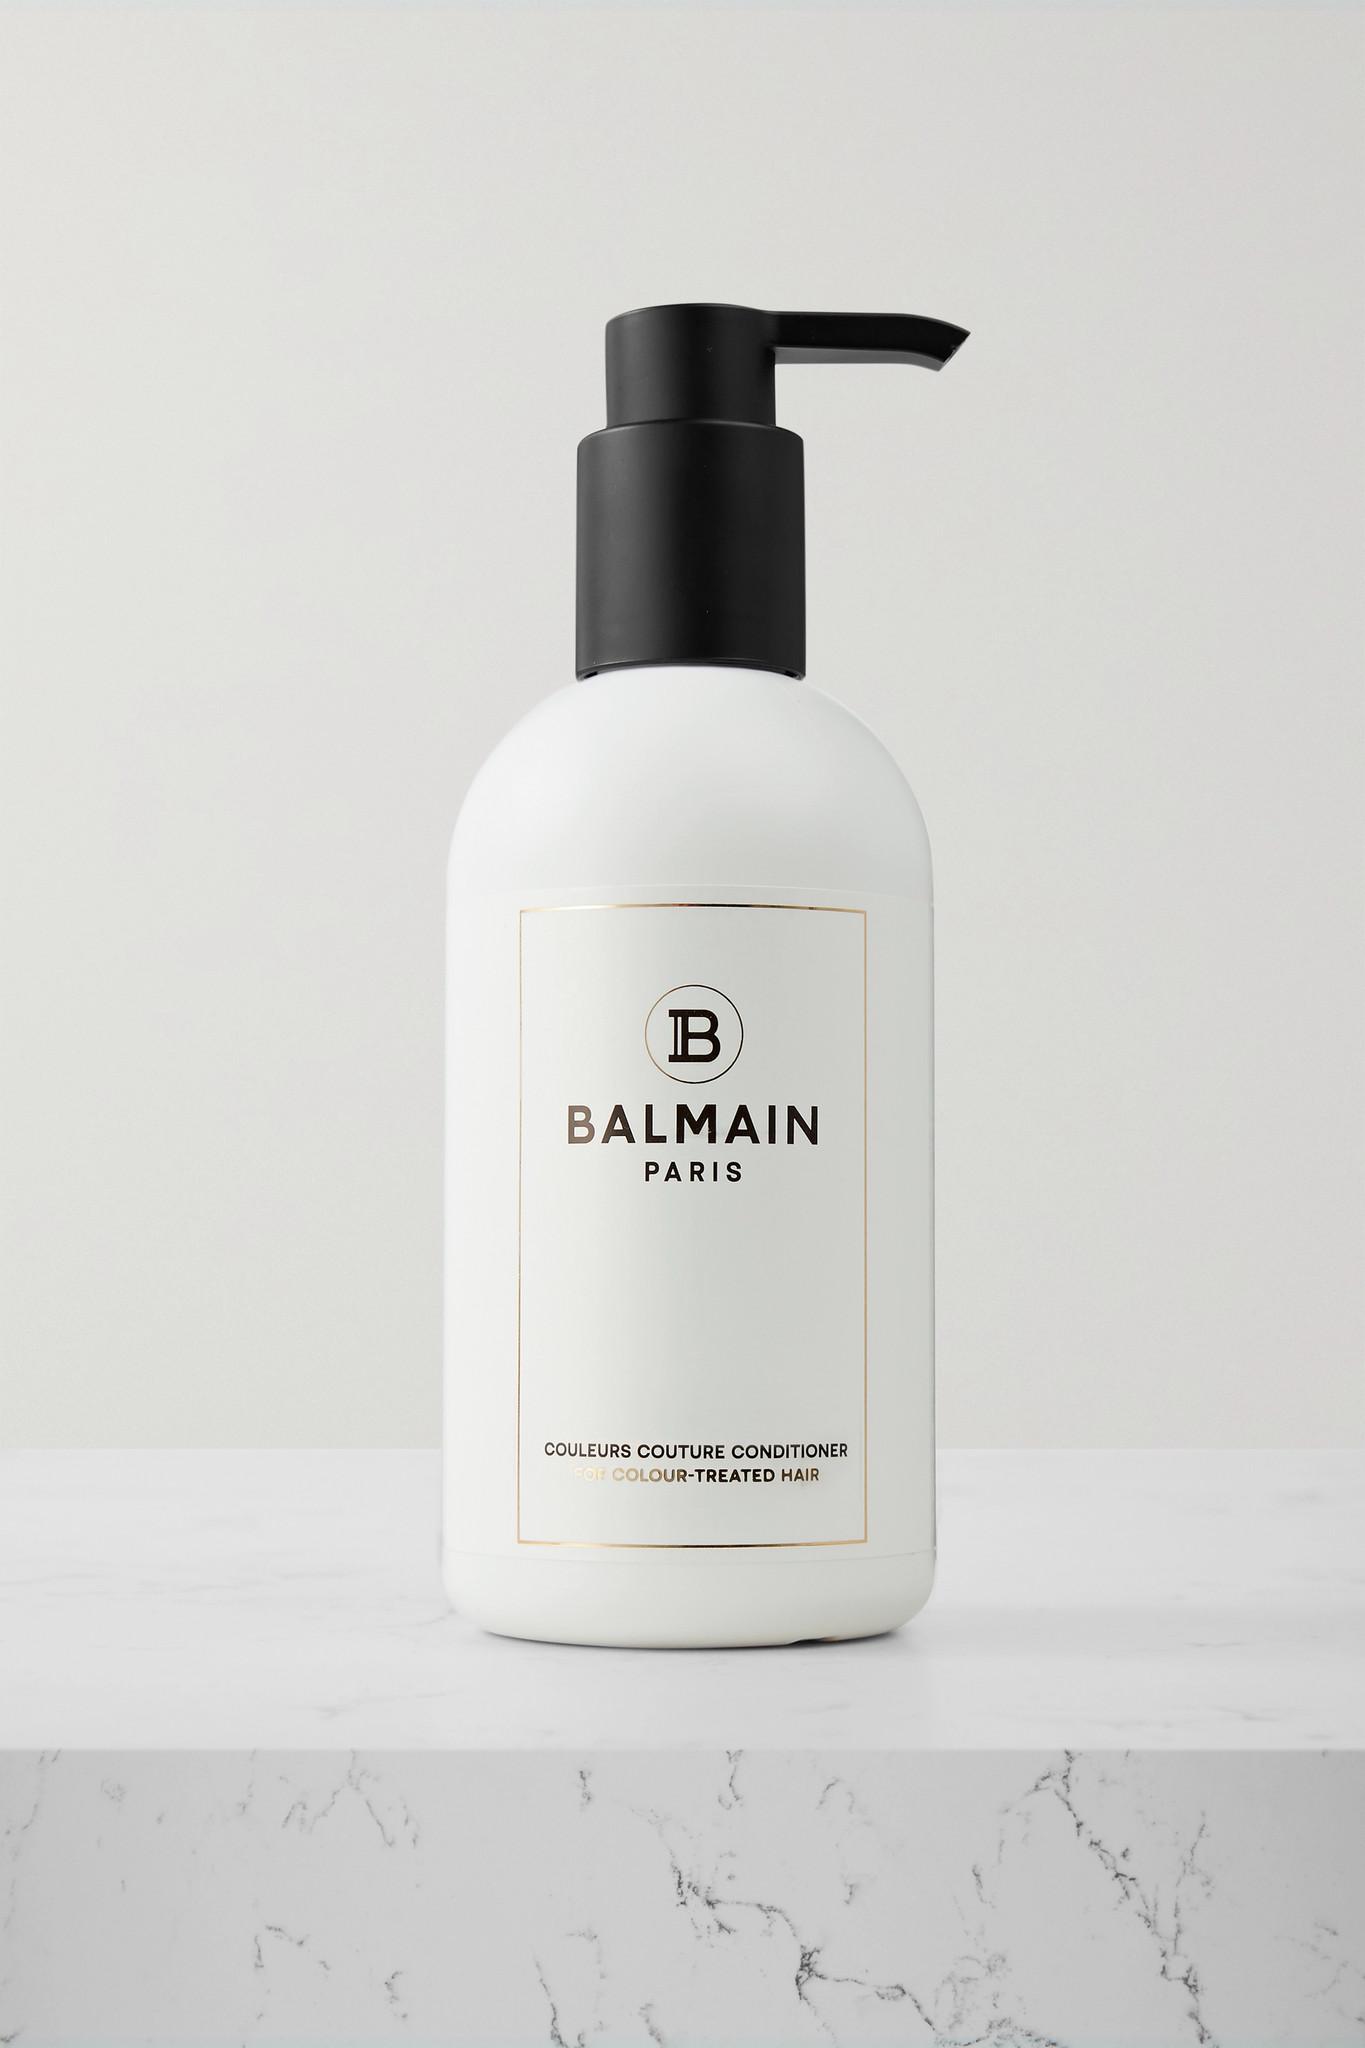 BALMAIN PARIS HAIR COUTURE - Couleurs Couture Conditioner, 300ml - one size